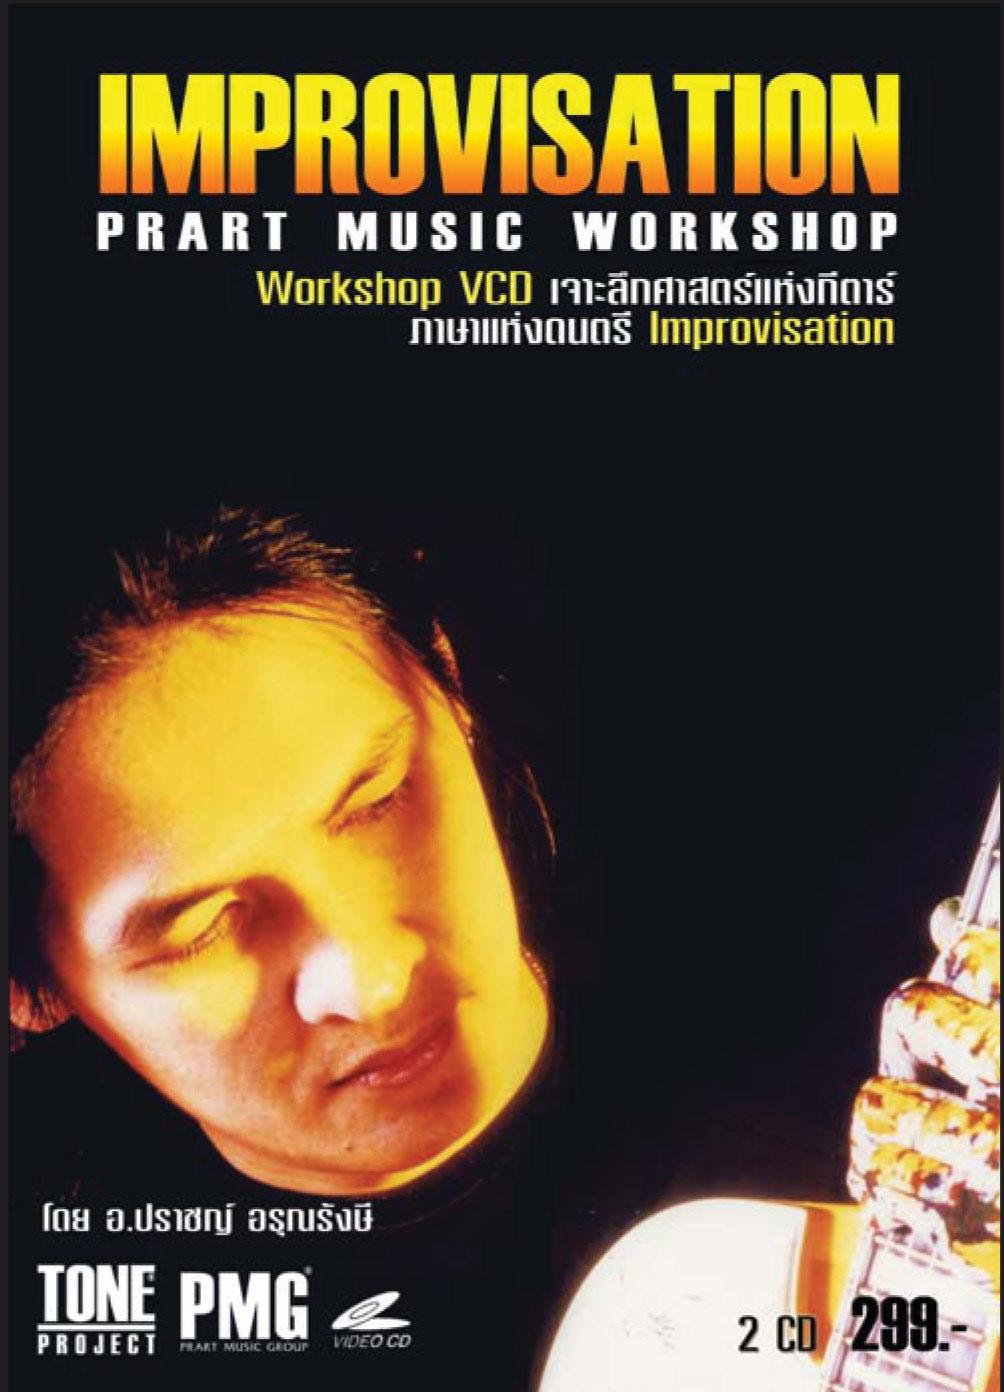 IMPROVISATION BY PRART (VCD)